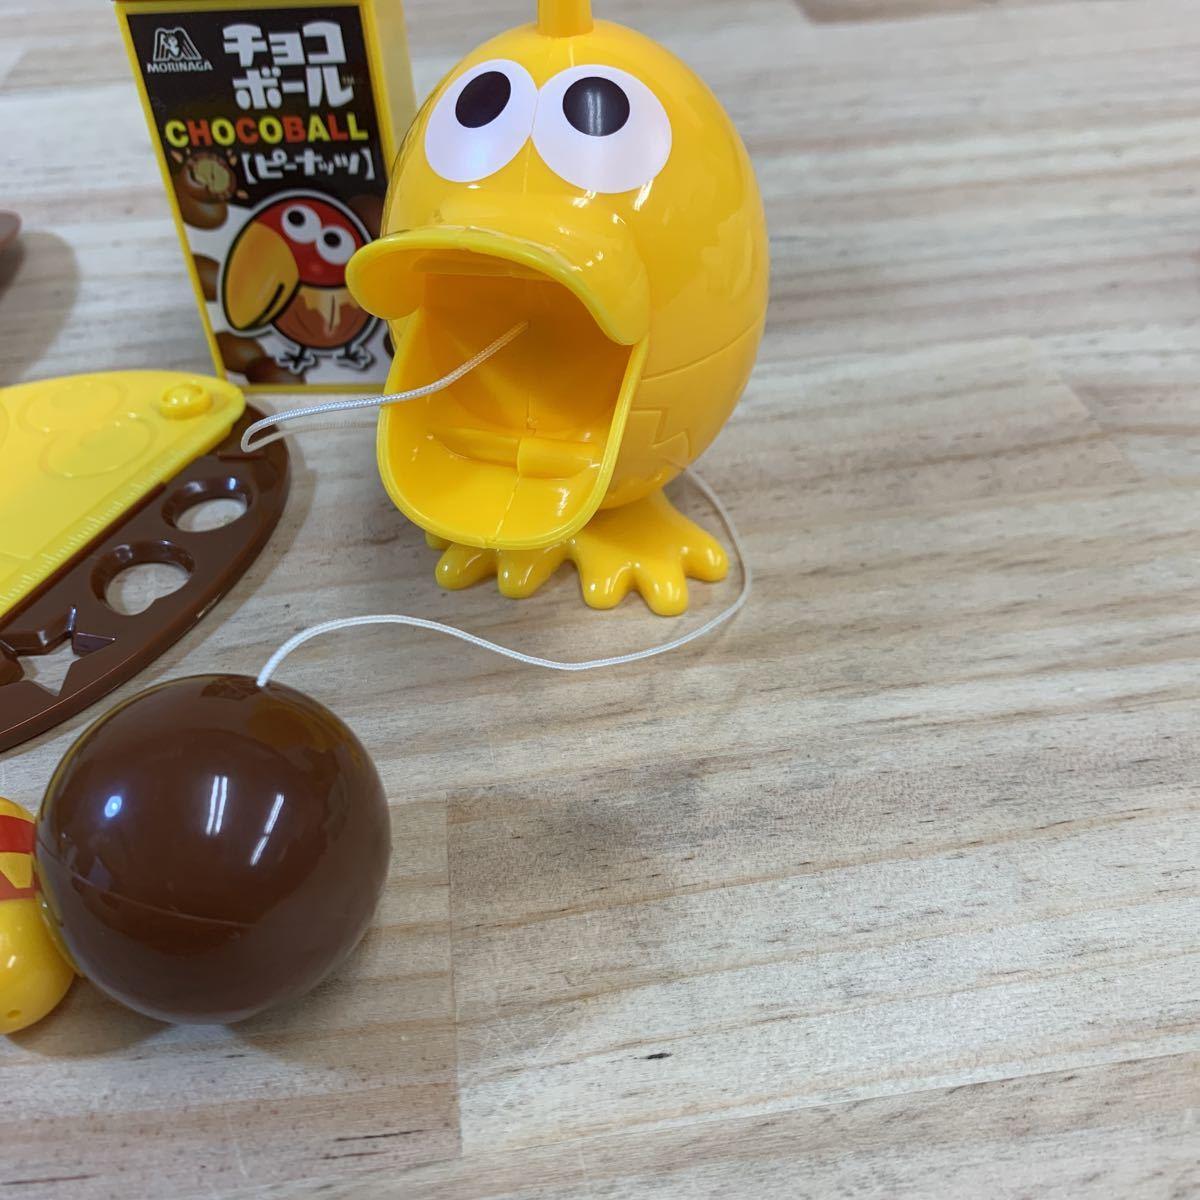 4N8728-5 しゃべる 金のキョロちゃん缶 森永チョコボール おもちゃのカンヅメ_画像7